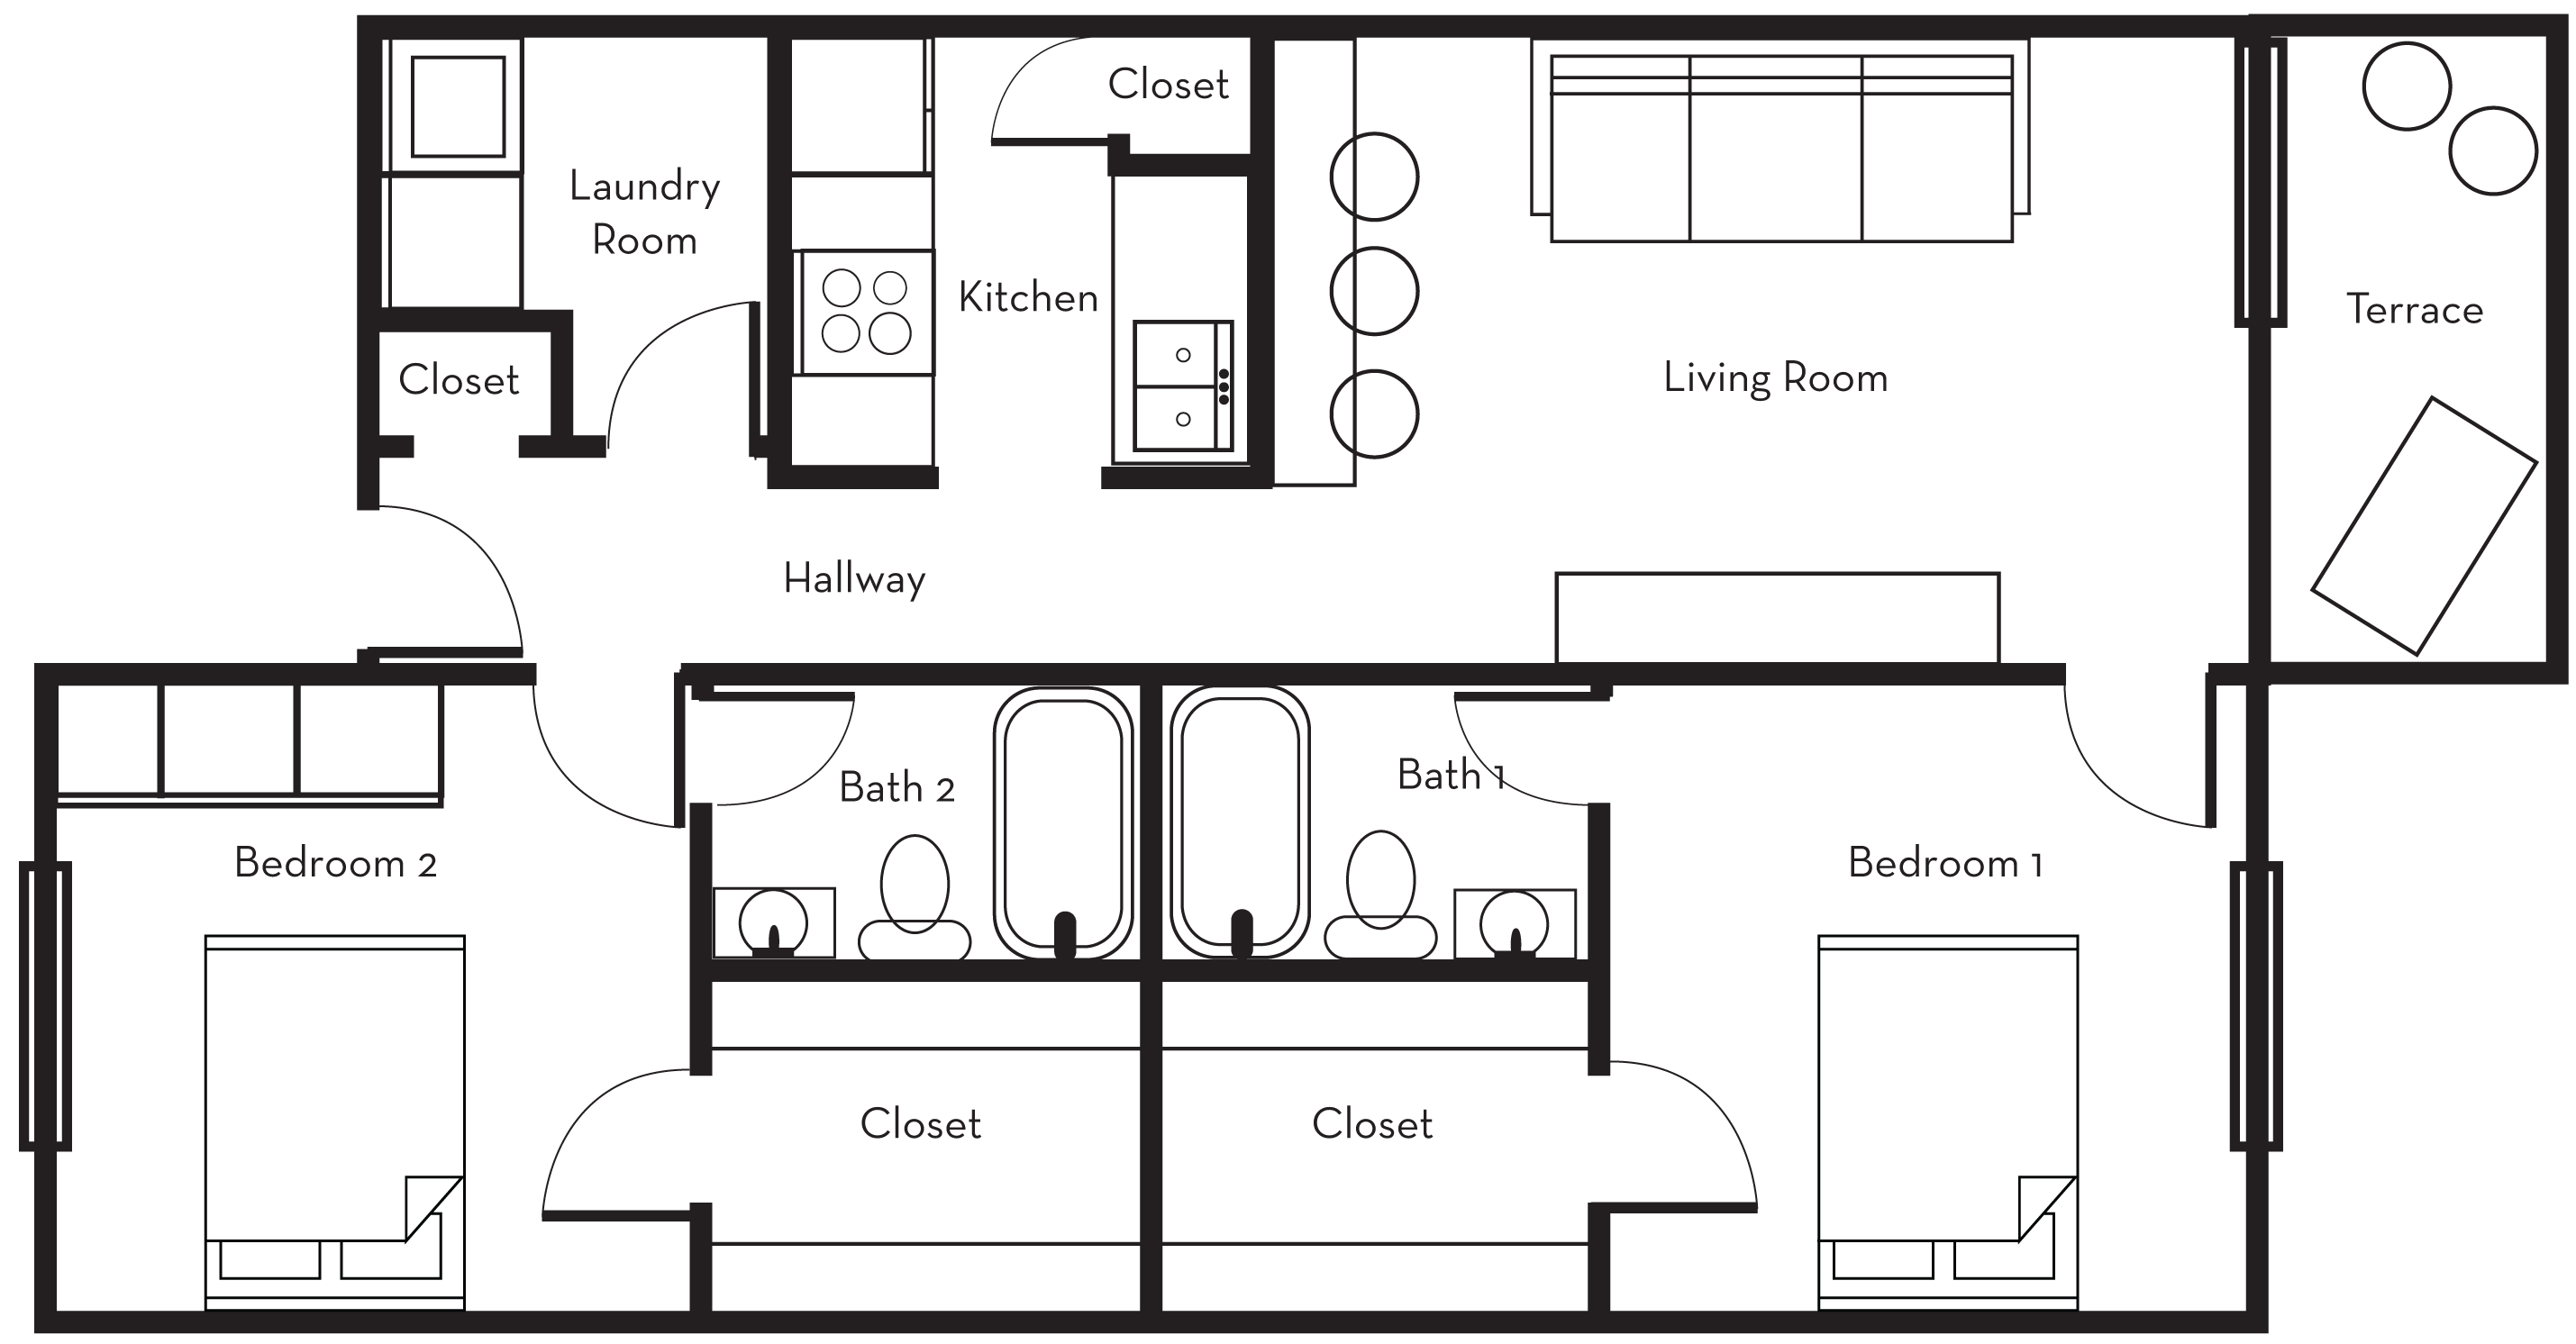 The George apartments in Statesboro, Georgia